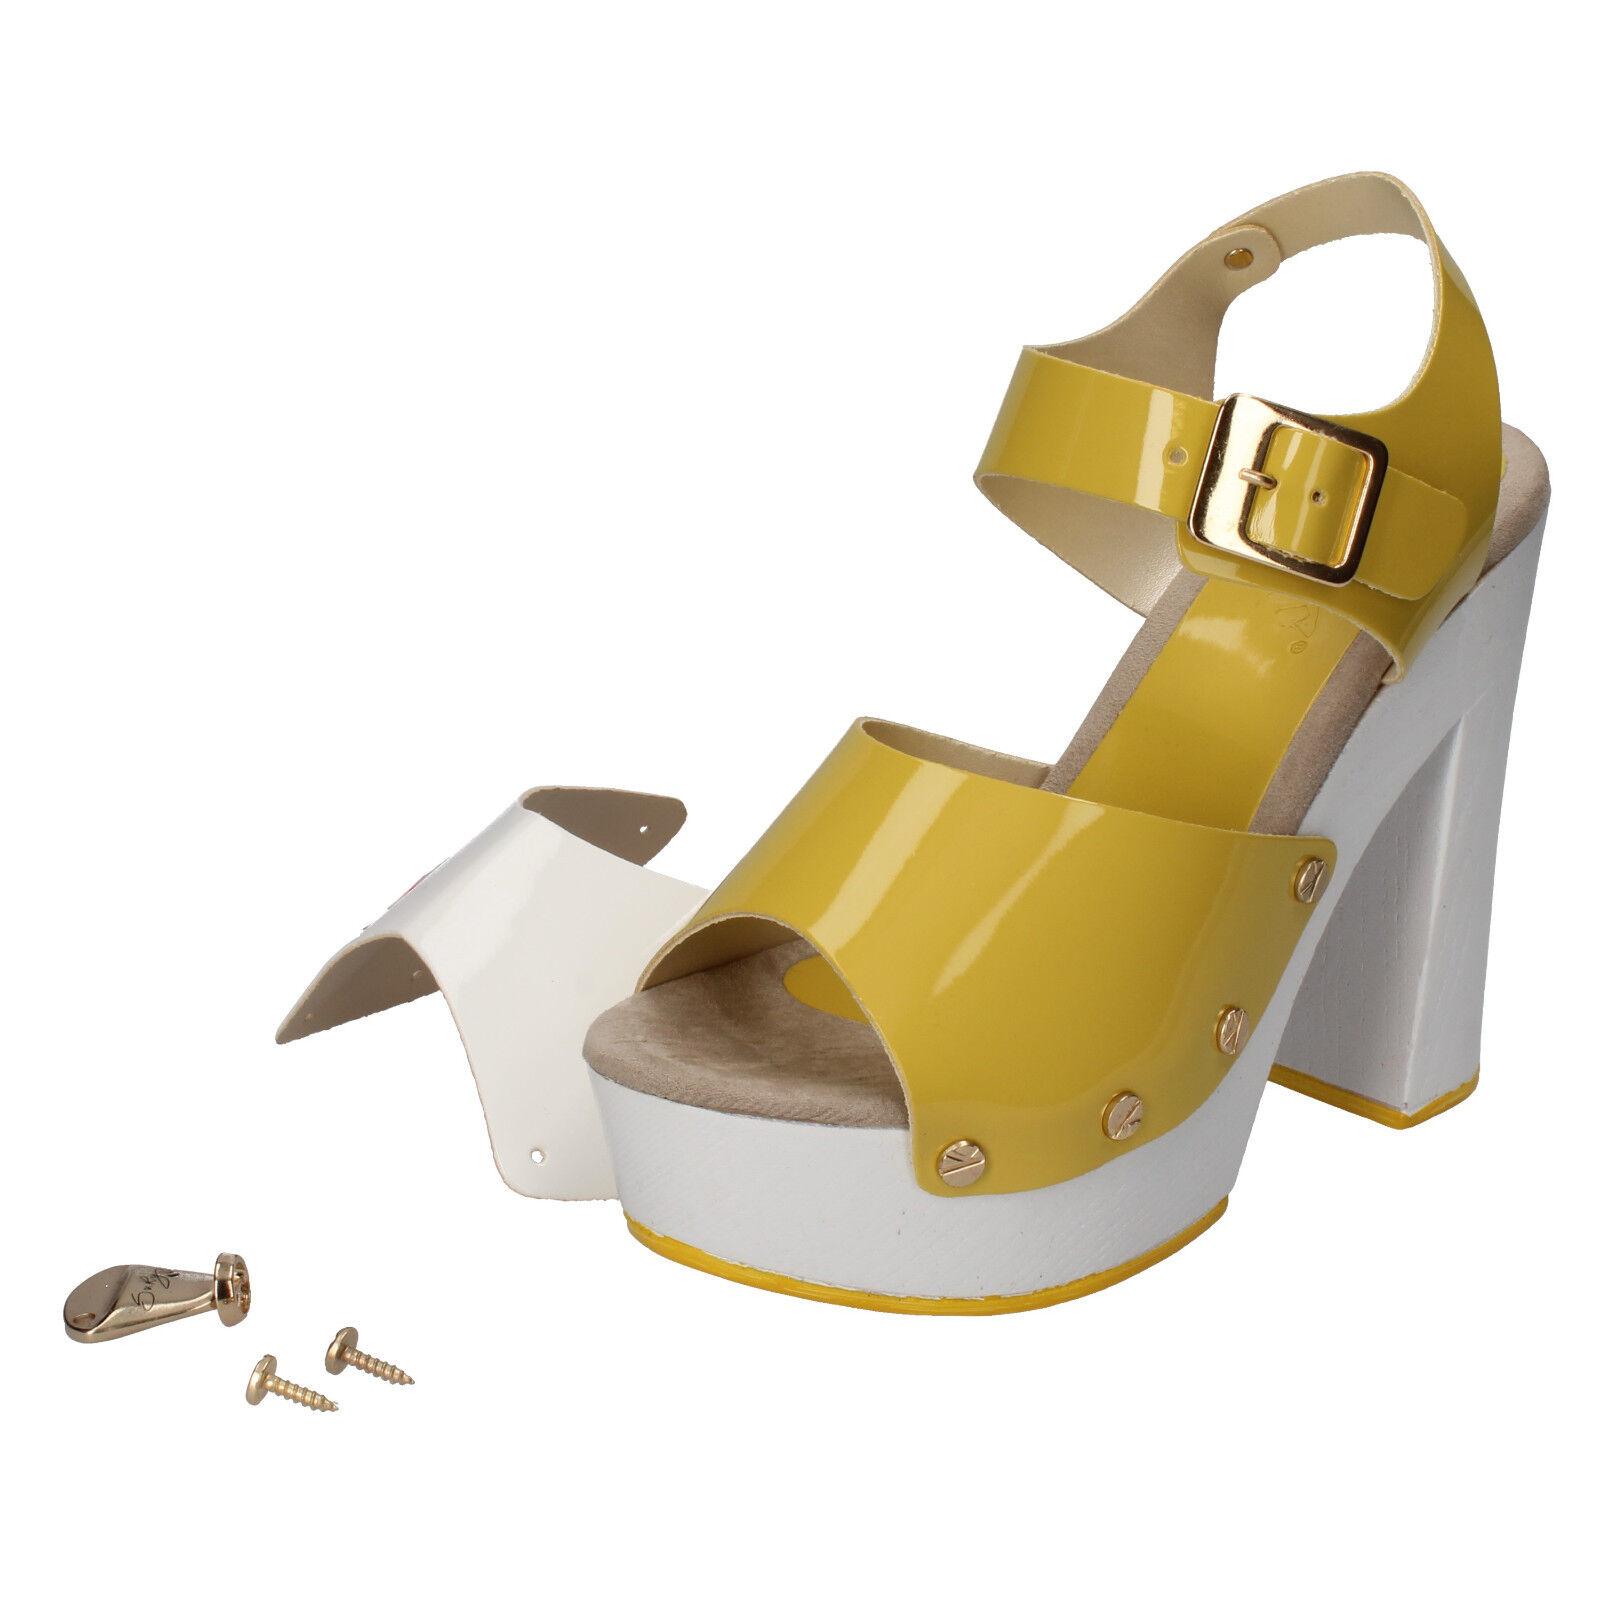 Scarpe donna SUKY BRAND 40 sandali giallo ( bianco ) vernice AC800-F